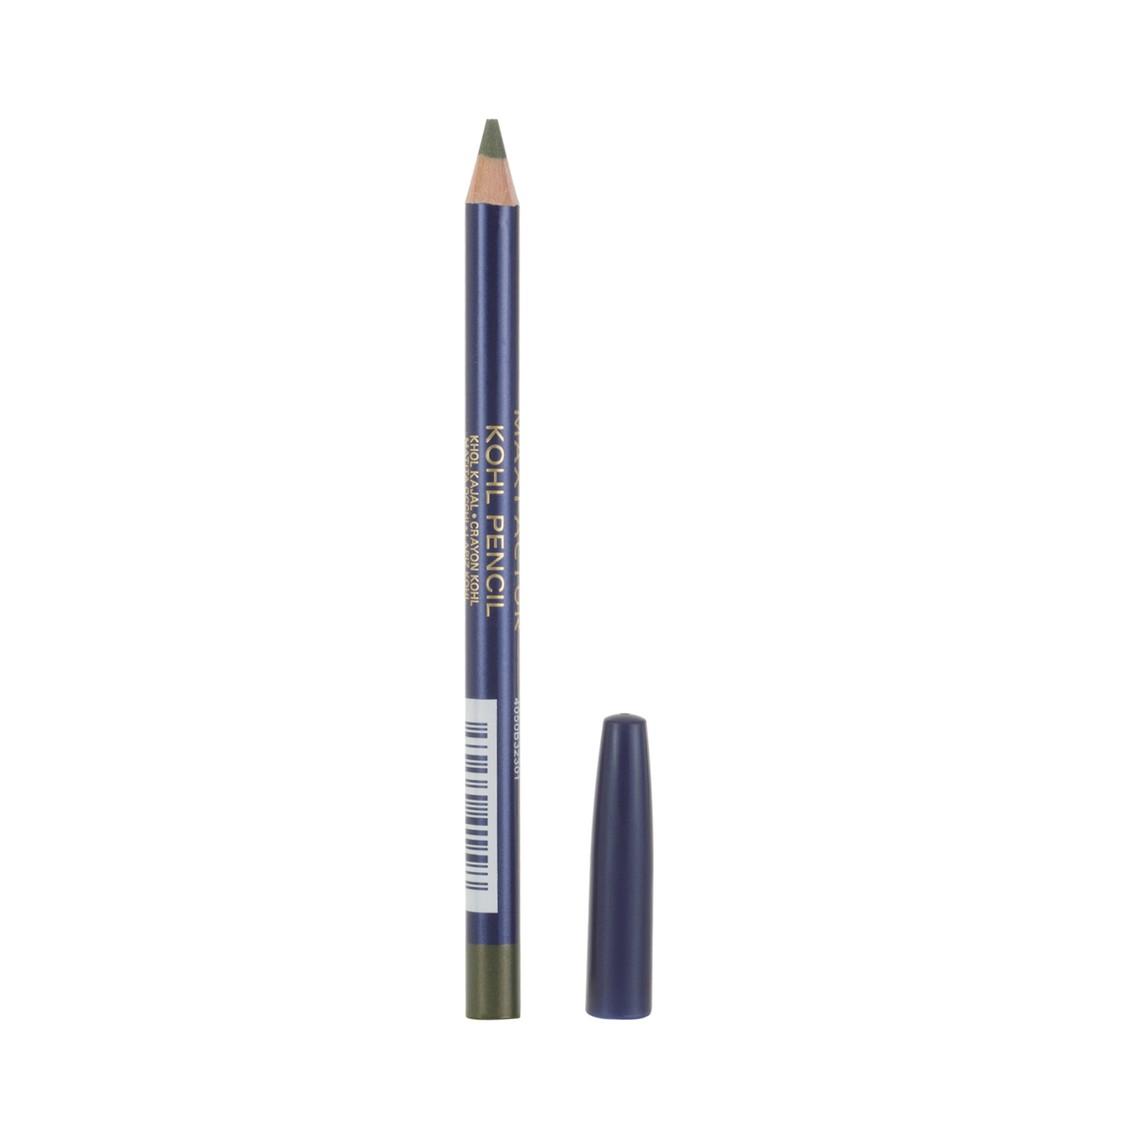 Max Factor Kohl Pencil